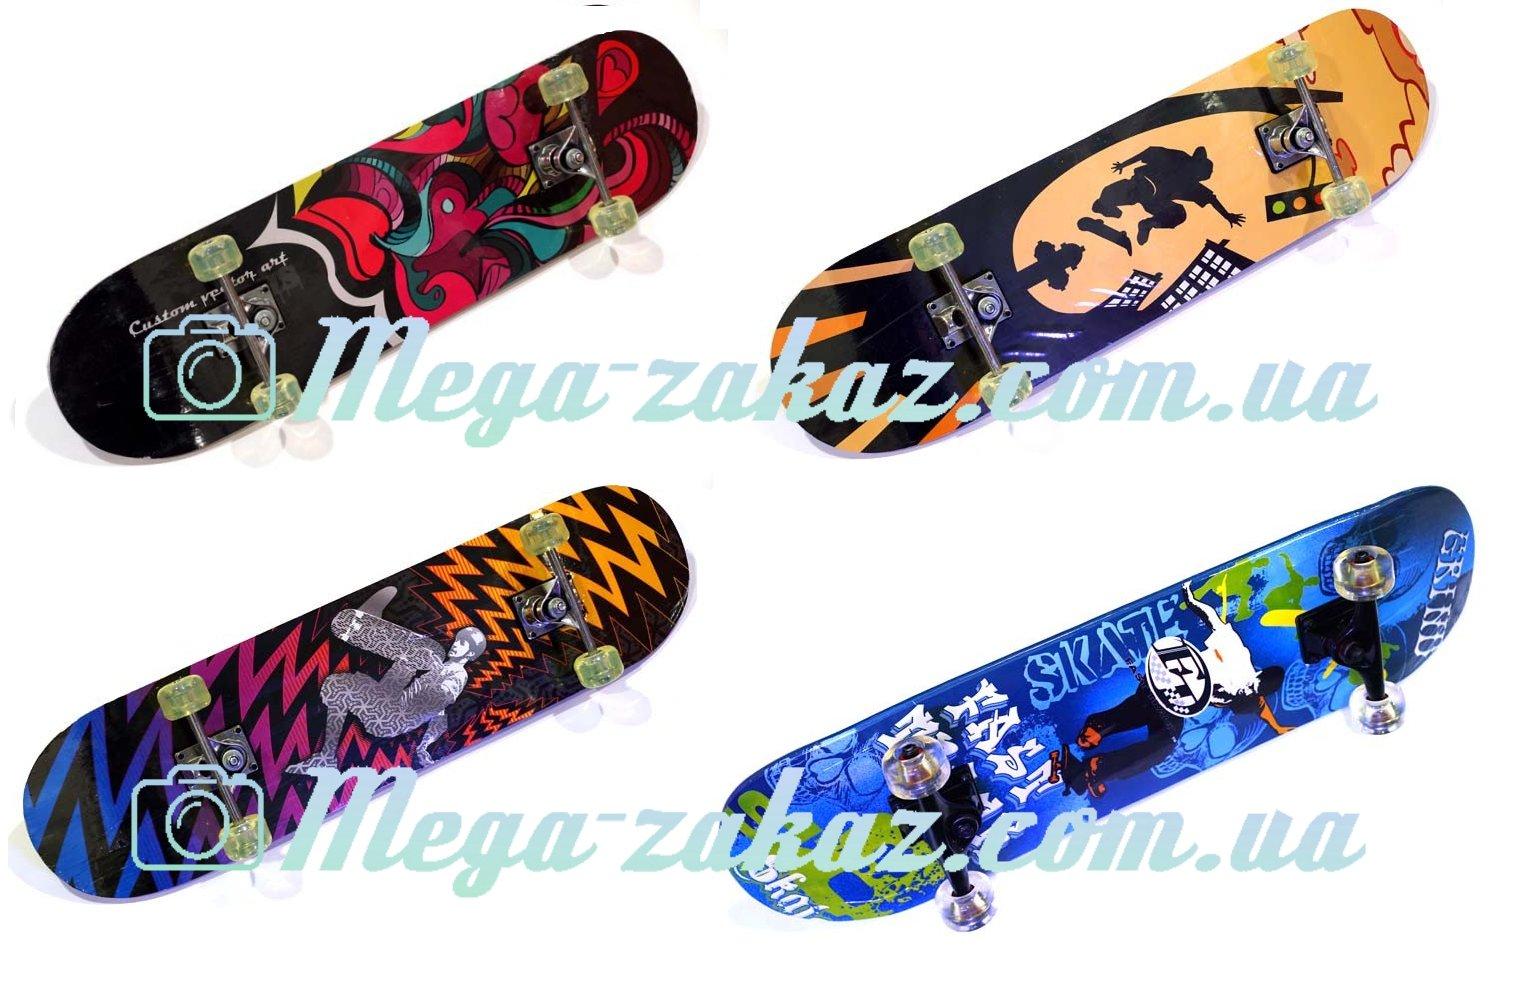 https://mega-zakaz.com.ua/images/upload/скейт%20ms%200321%205ZAKAZ.jpg